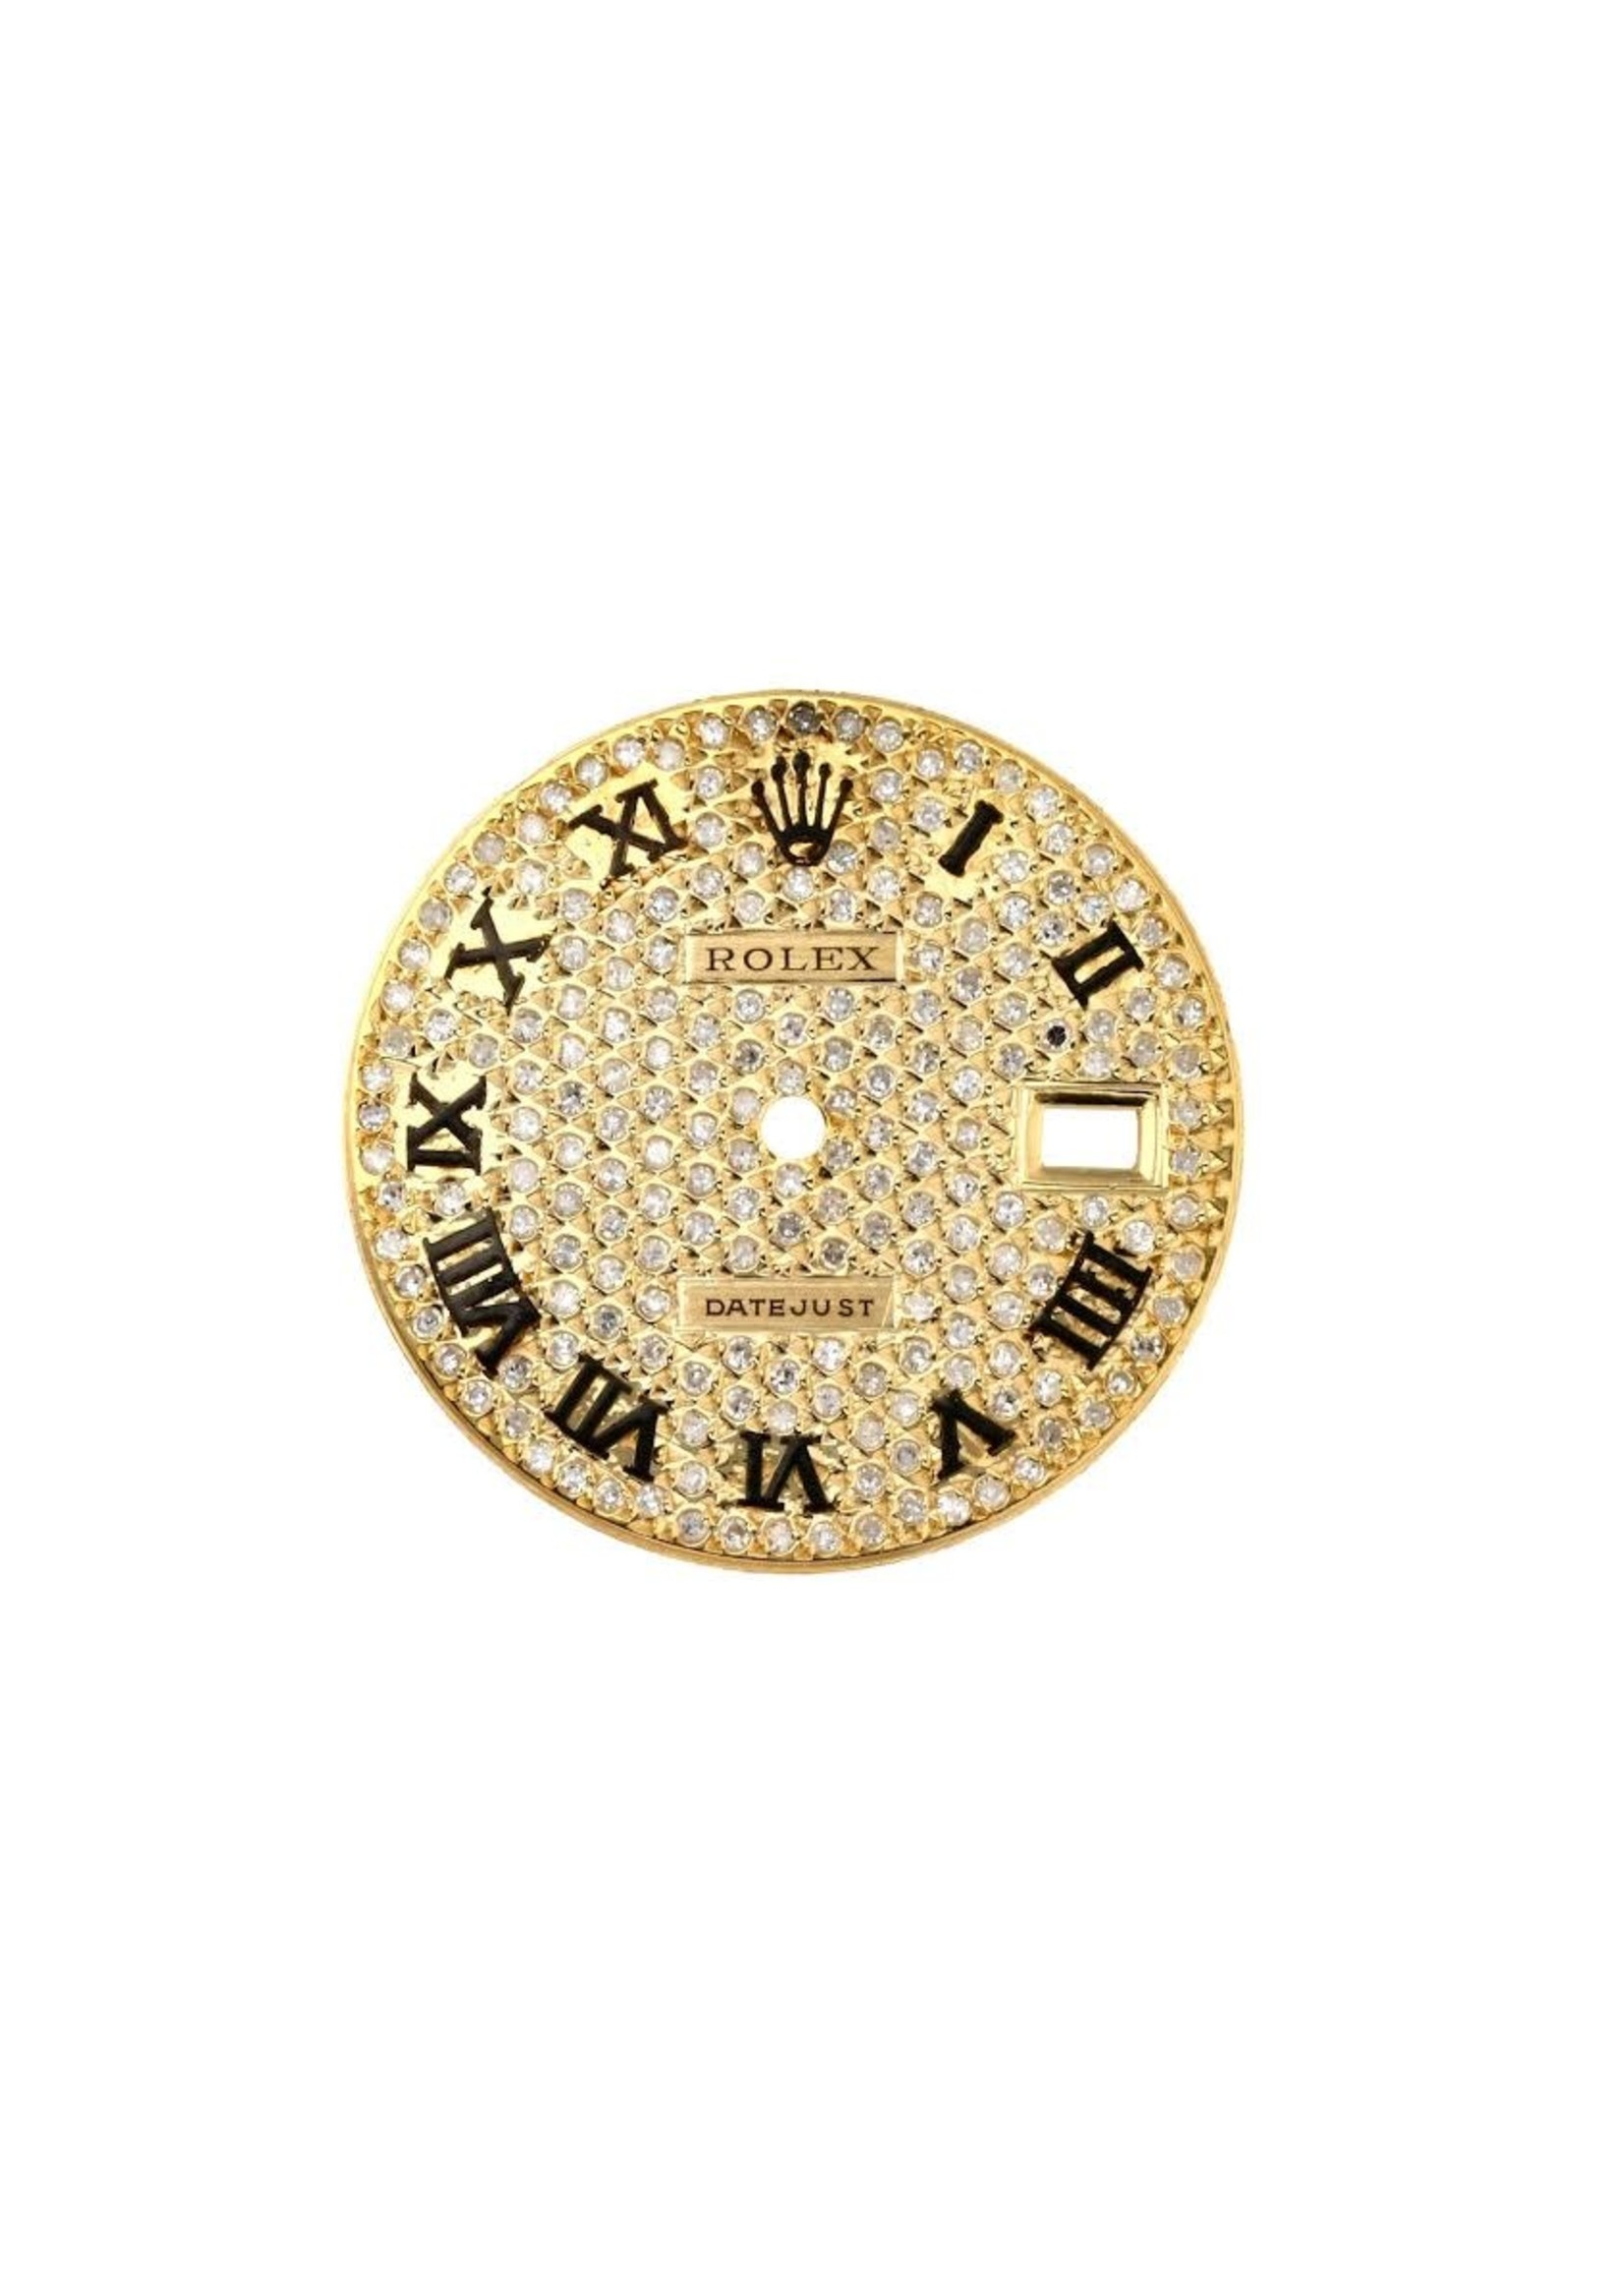 Other Brands CUSTOM ROLEX DATEJUST 36MM DIAMOND DIAL